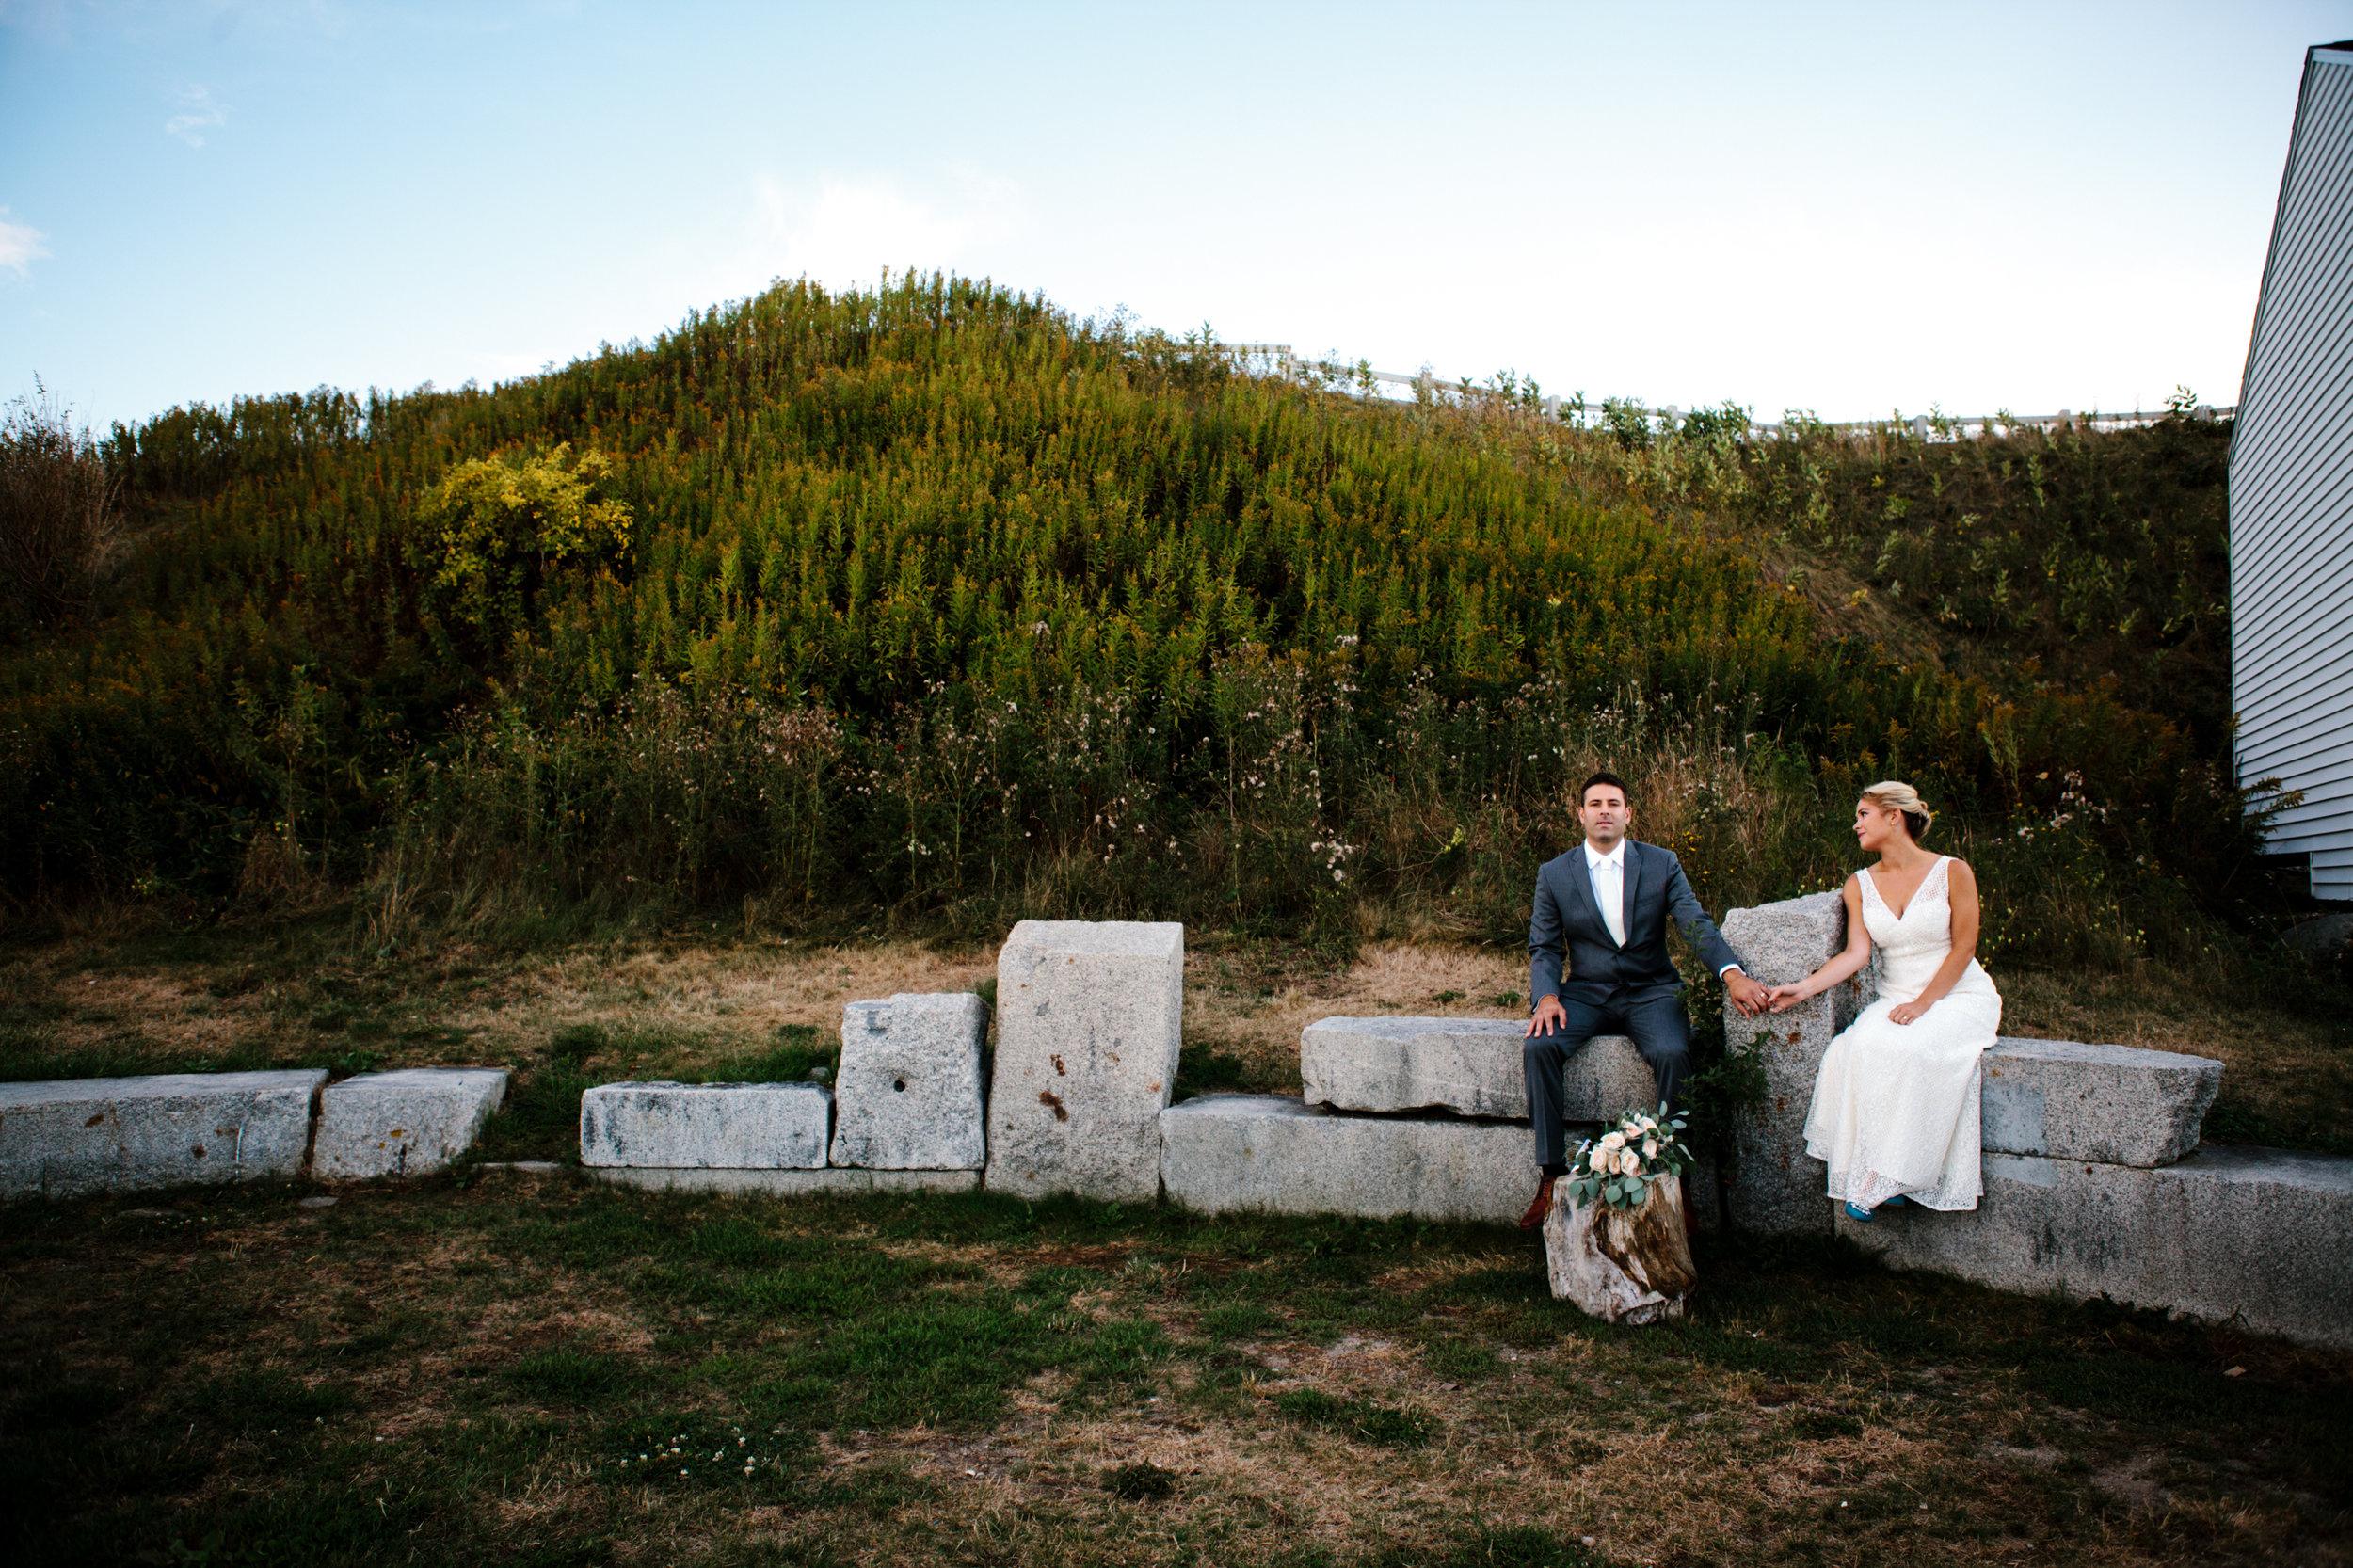 spring-point-ledge-lighthouse-wedding-south-portland-maine-2642.jpg